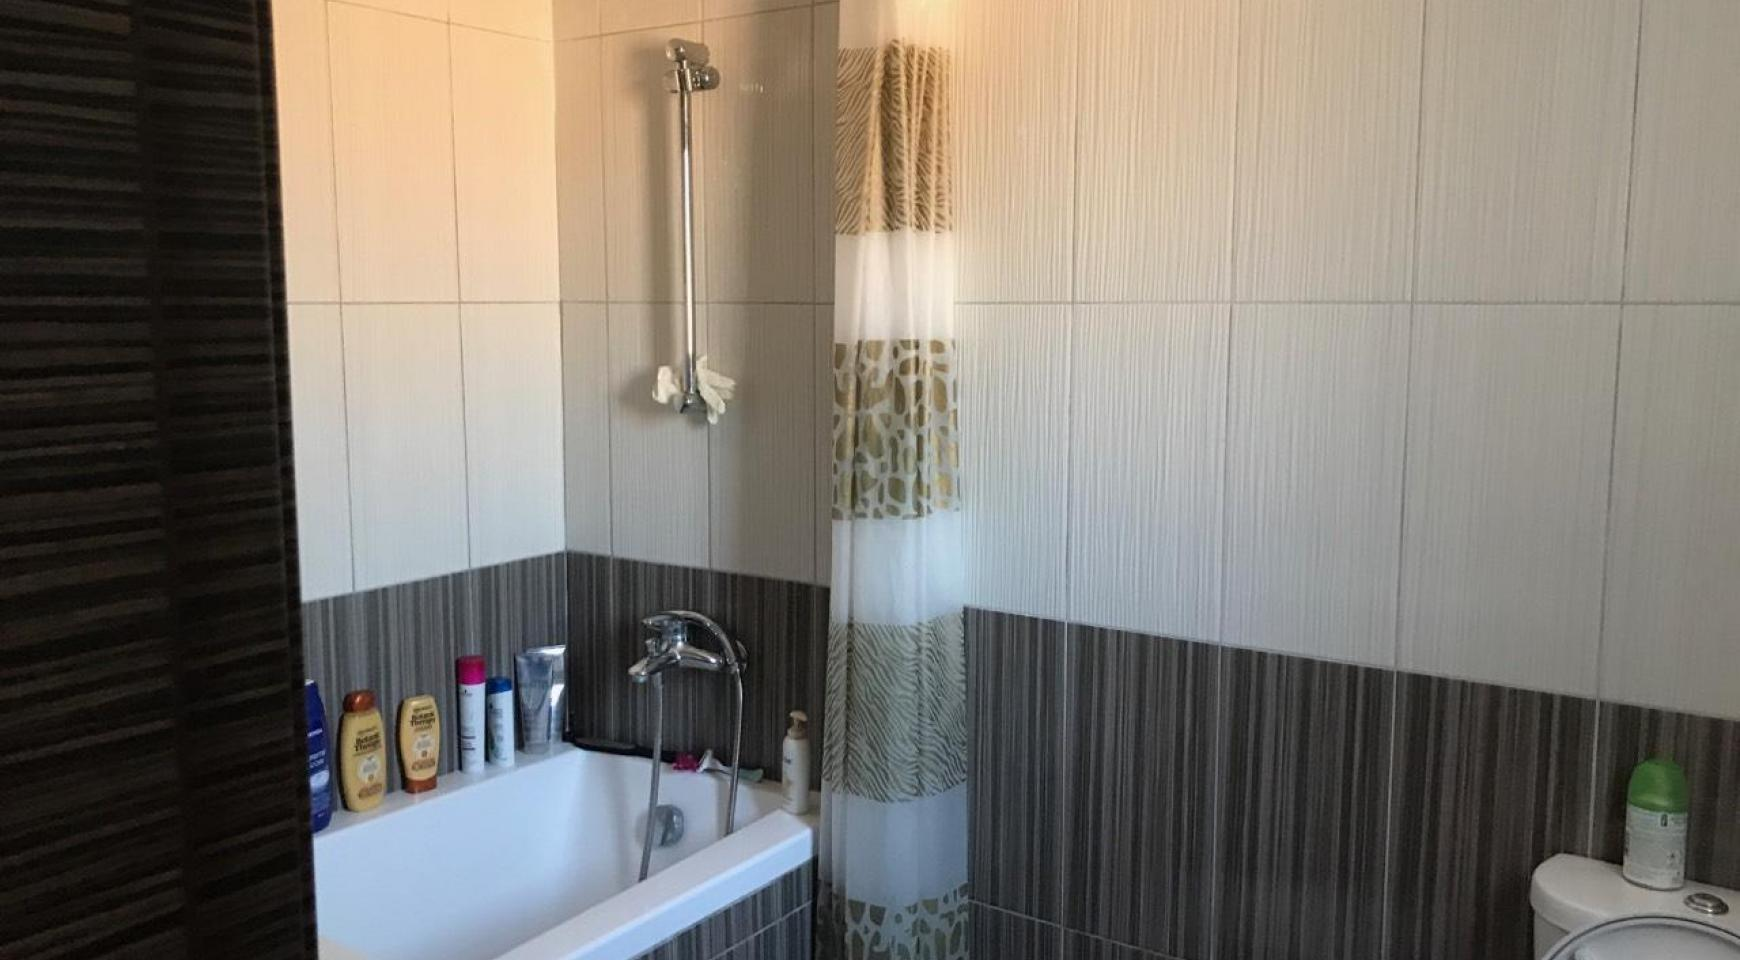 3 Bedroom Apartment in Molos Area near Limassol Marina - 20